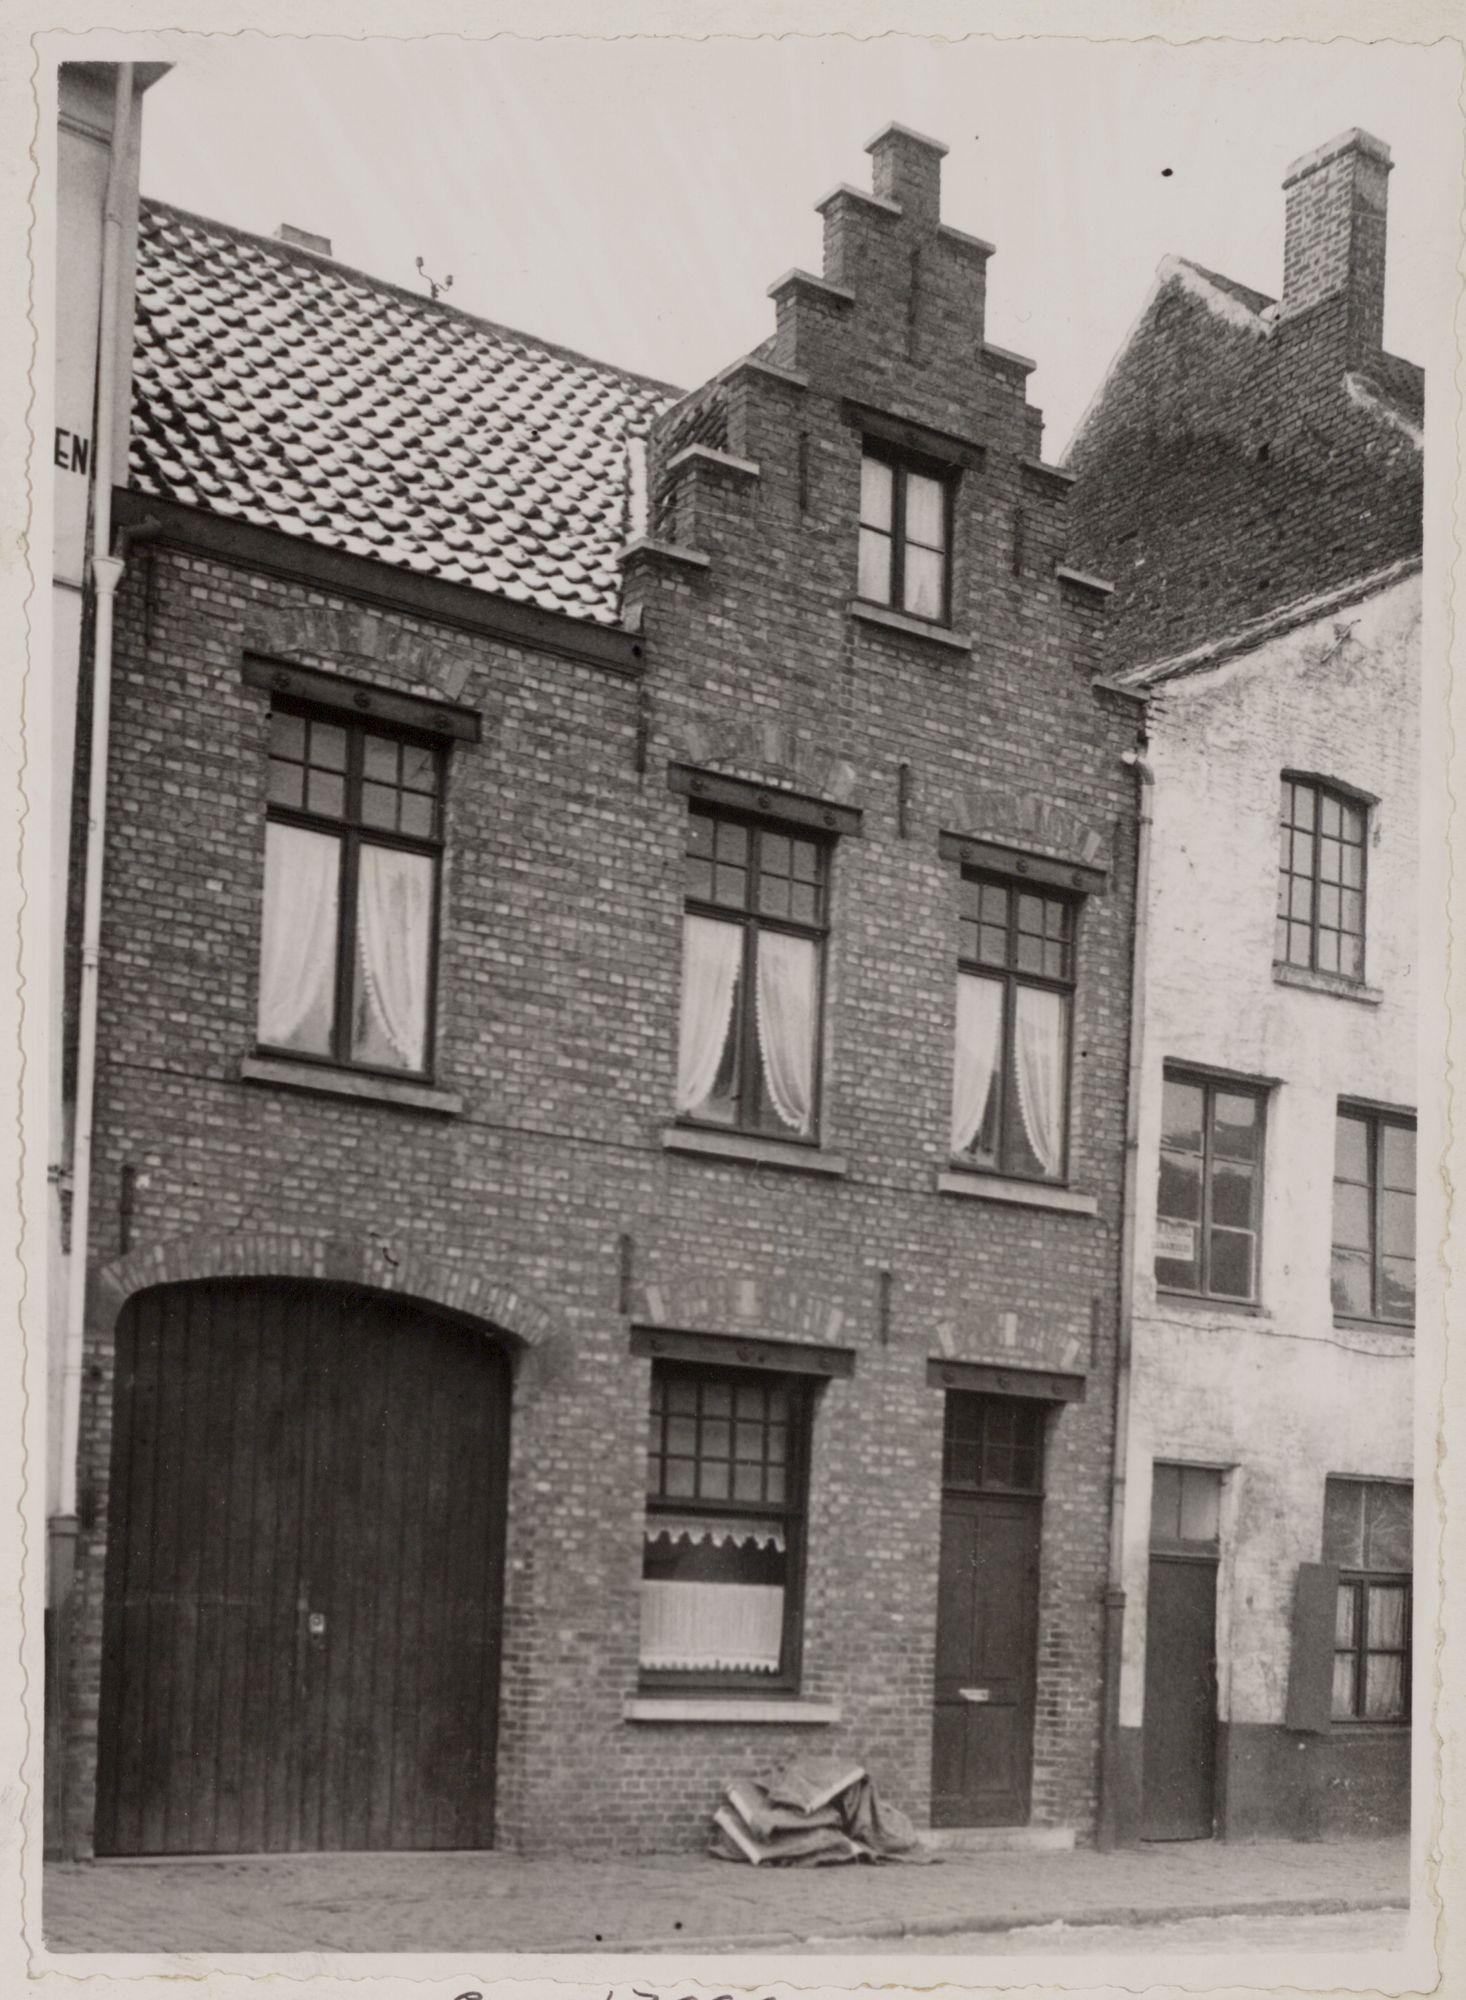 Gent: Trapgevelhuis, Lievekaai 10-11